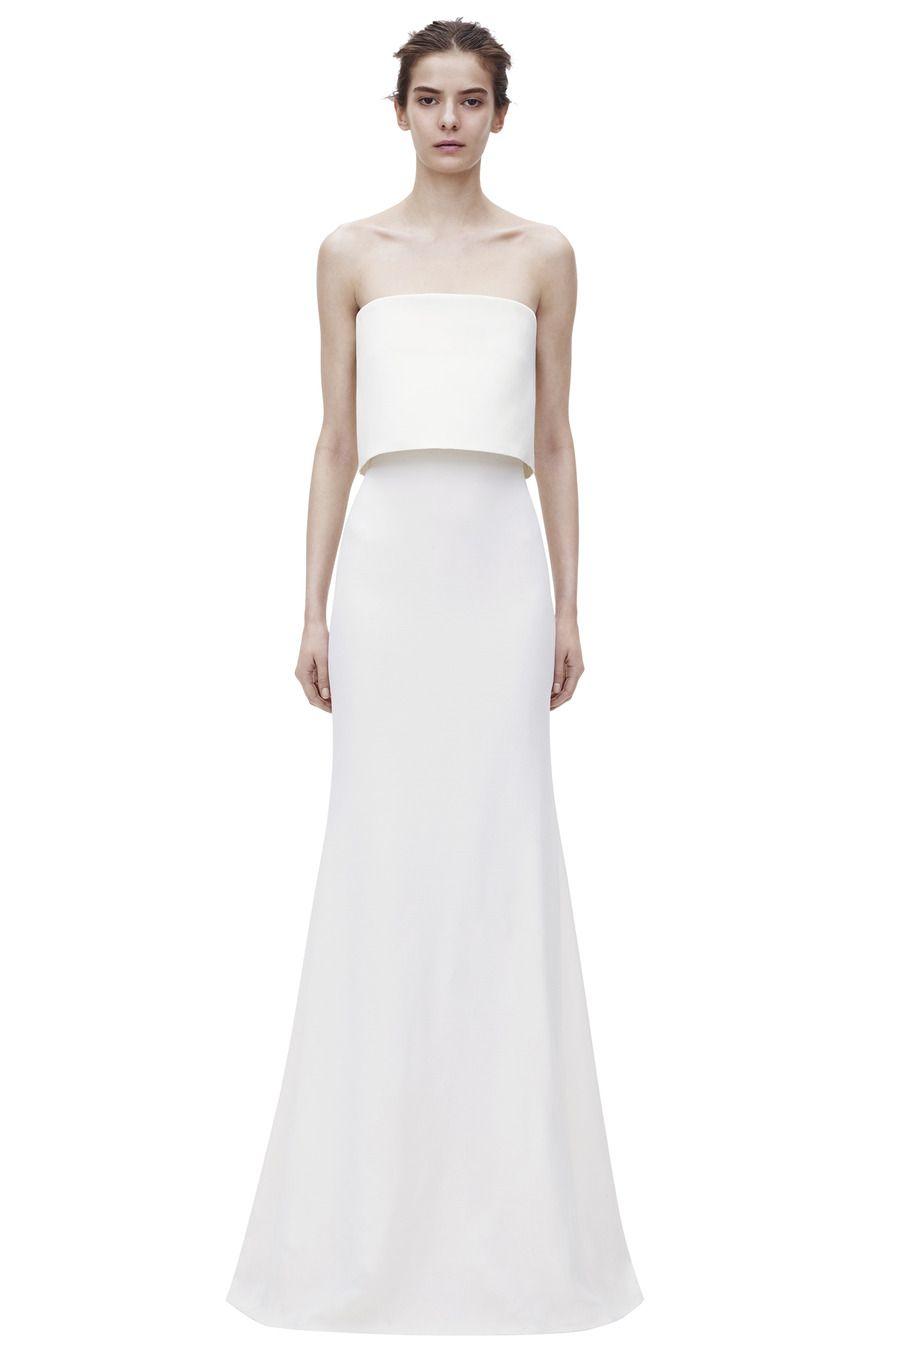 Cropped Top Floorlength Gown| VICTORIA BECKHAM #Bridal #Wedding ...